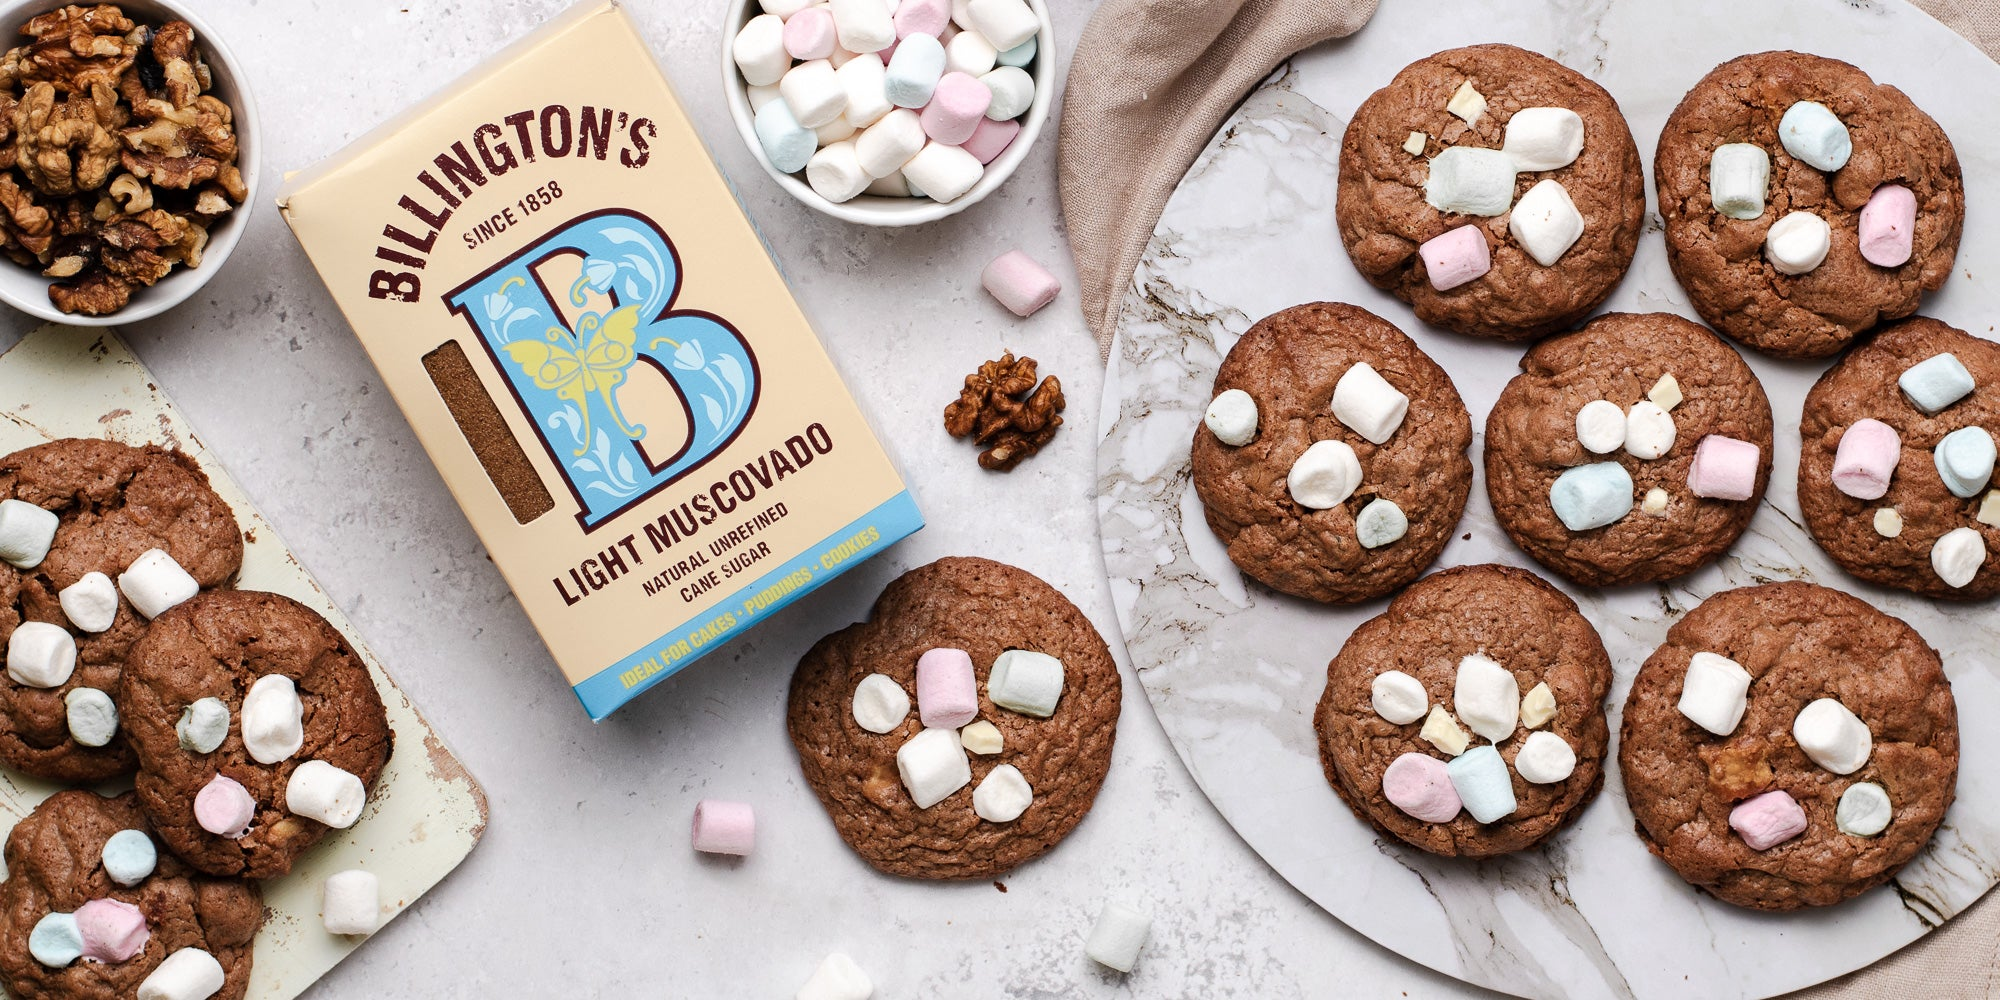 Rocky Road Cookies lay next to a box of Billington's Light Muscovado sugar, and ramekins of walnuts and mini marshmallows